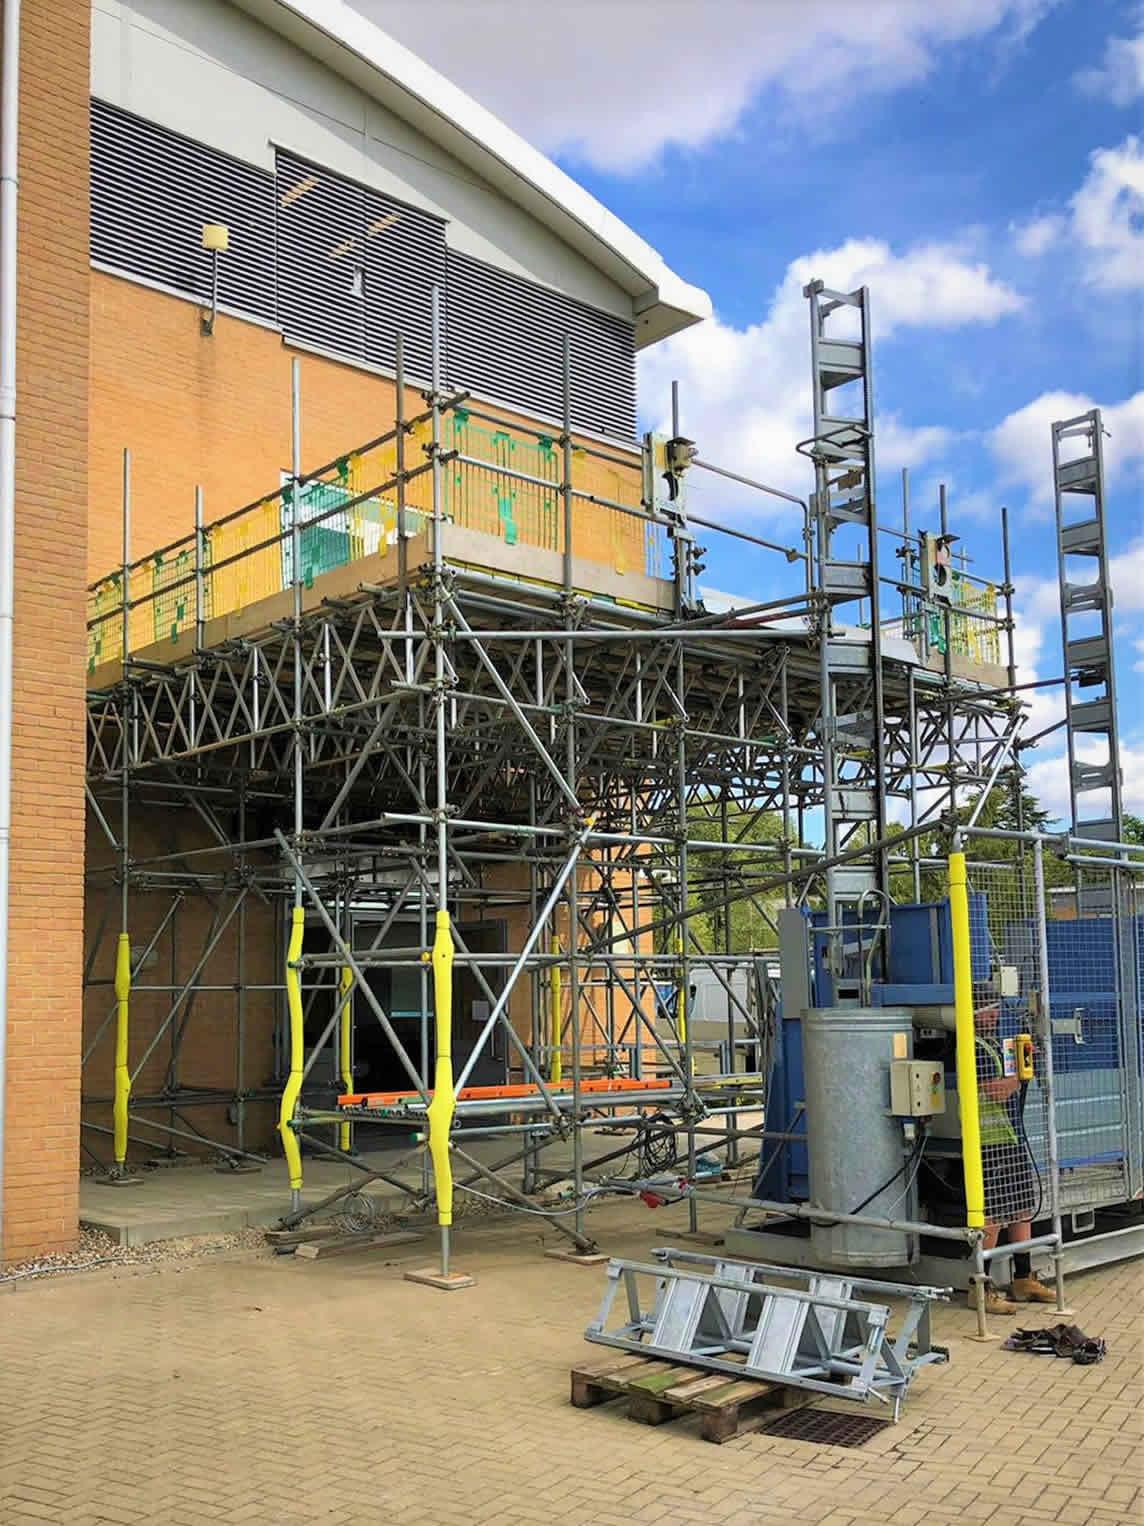 saffron-waldon-scaffolding-project3.jpg